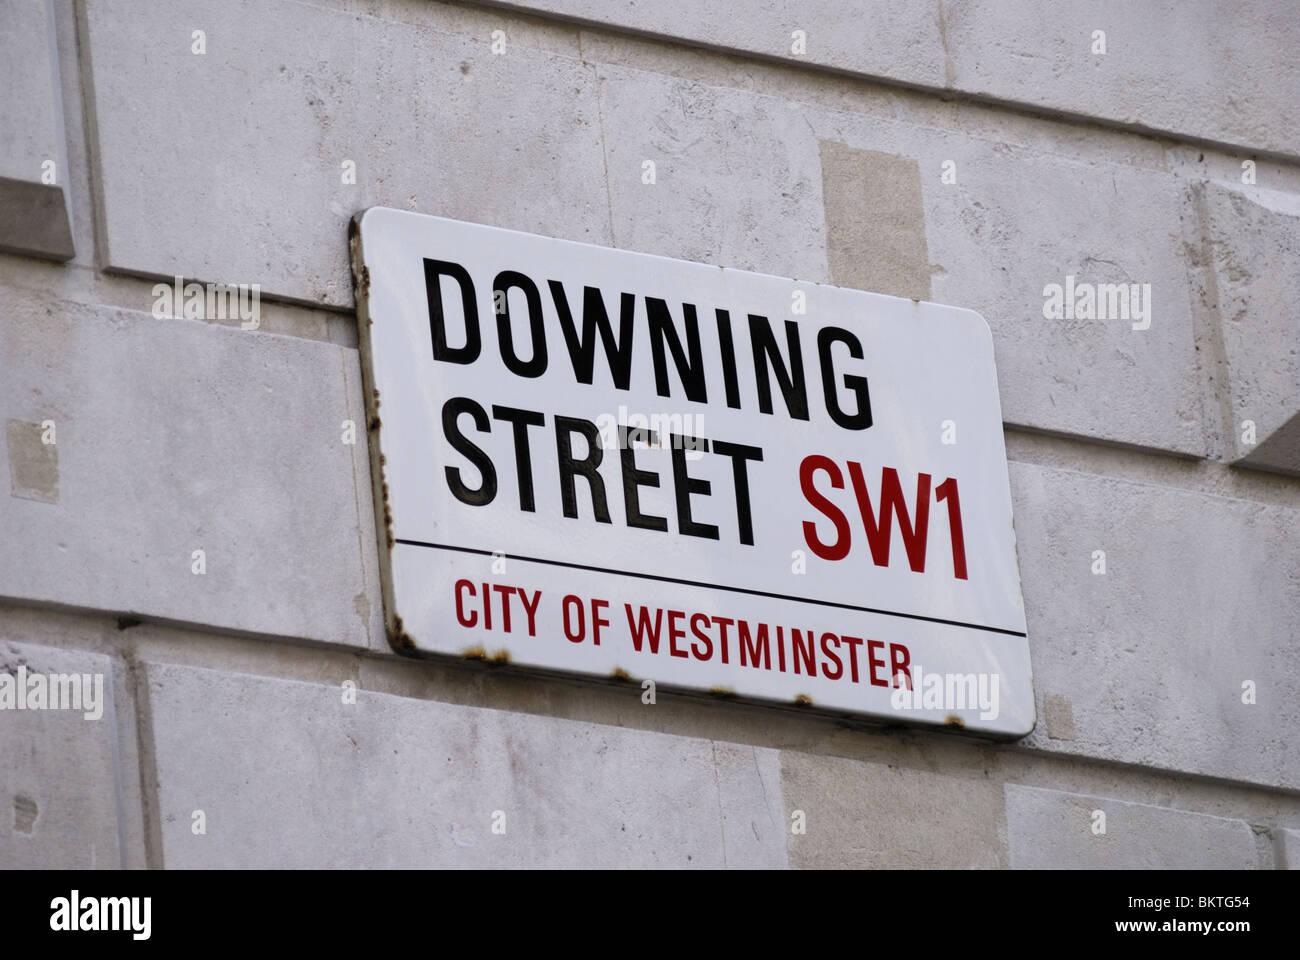 Downing Street Sign, Westminster, London, England, UK - Stock Image